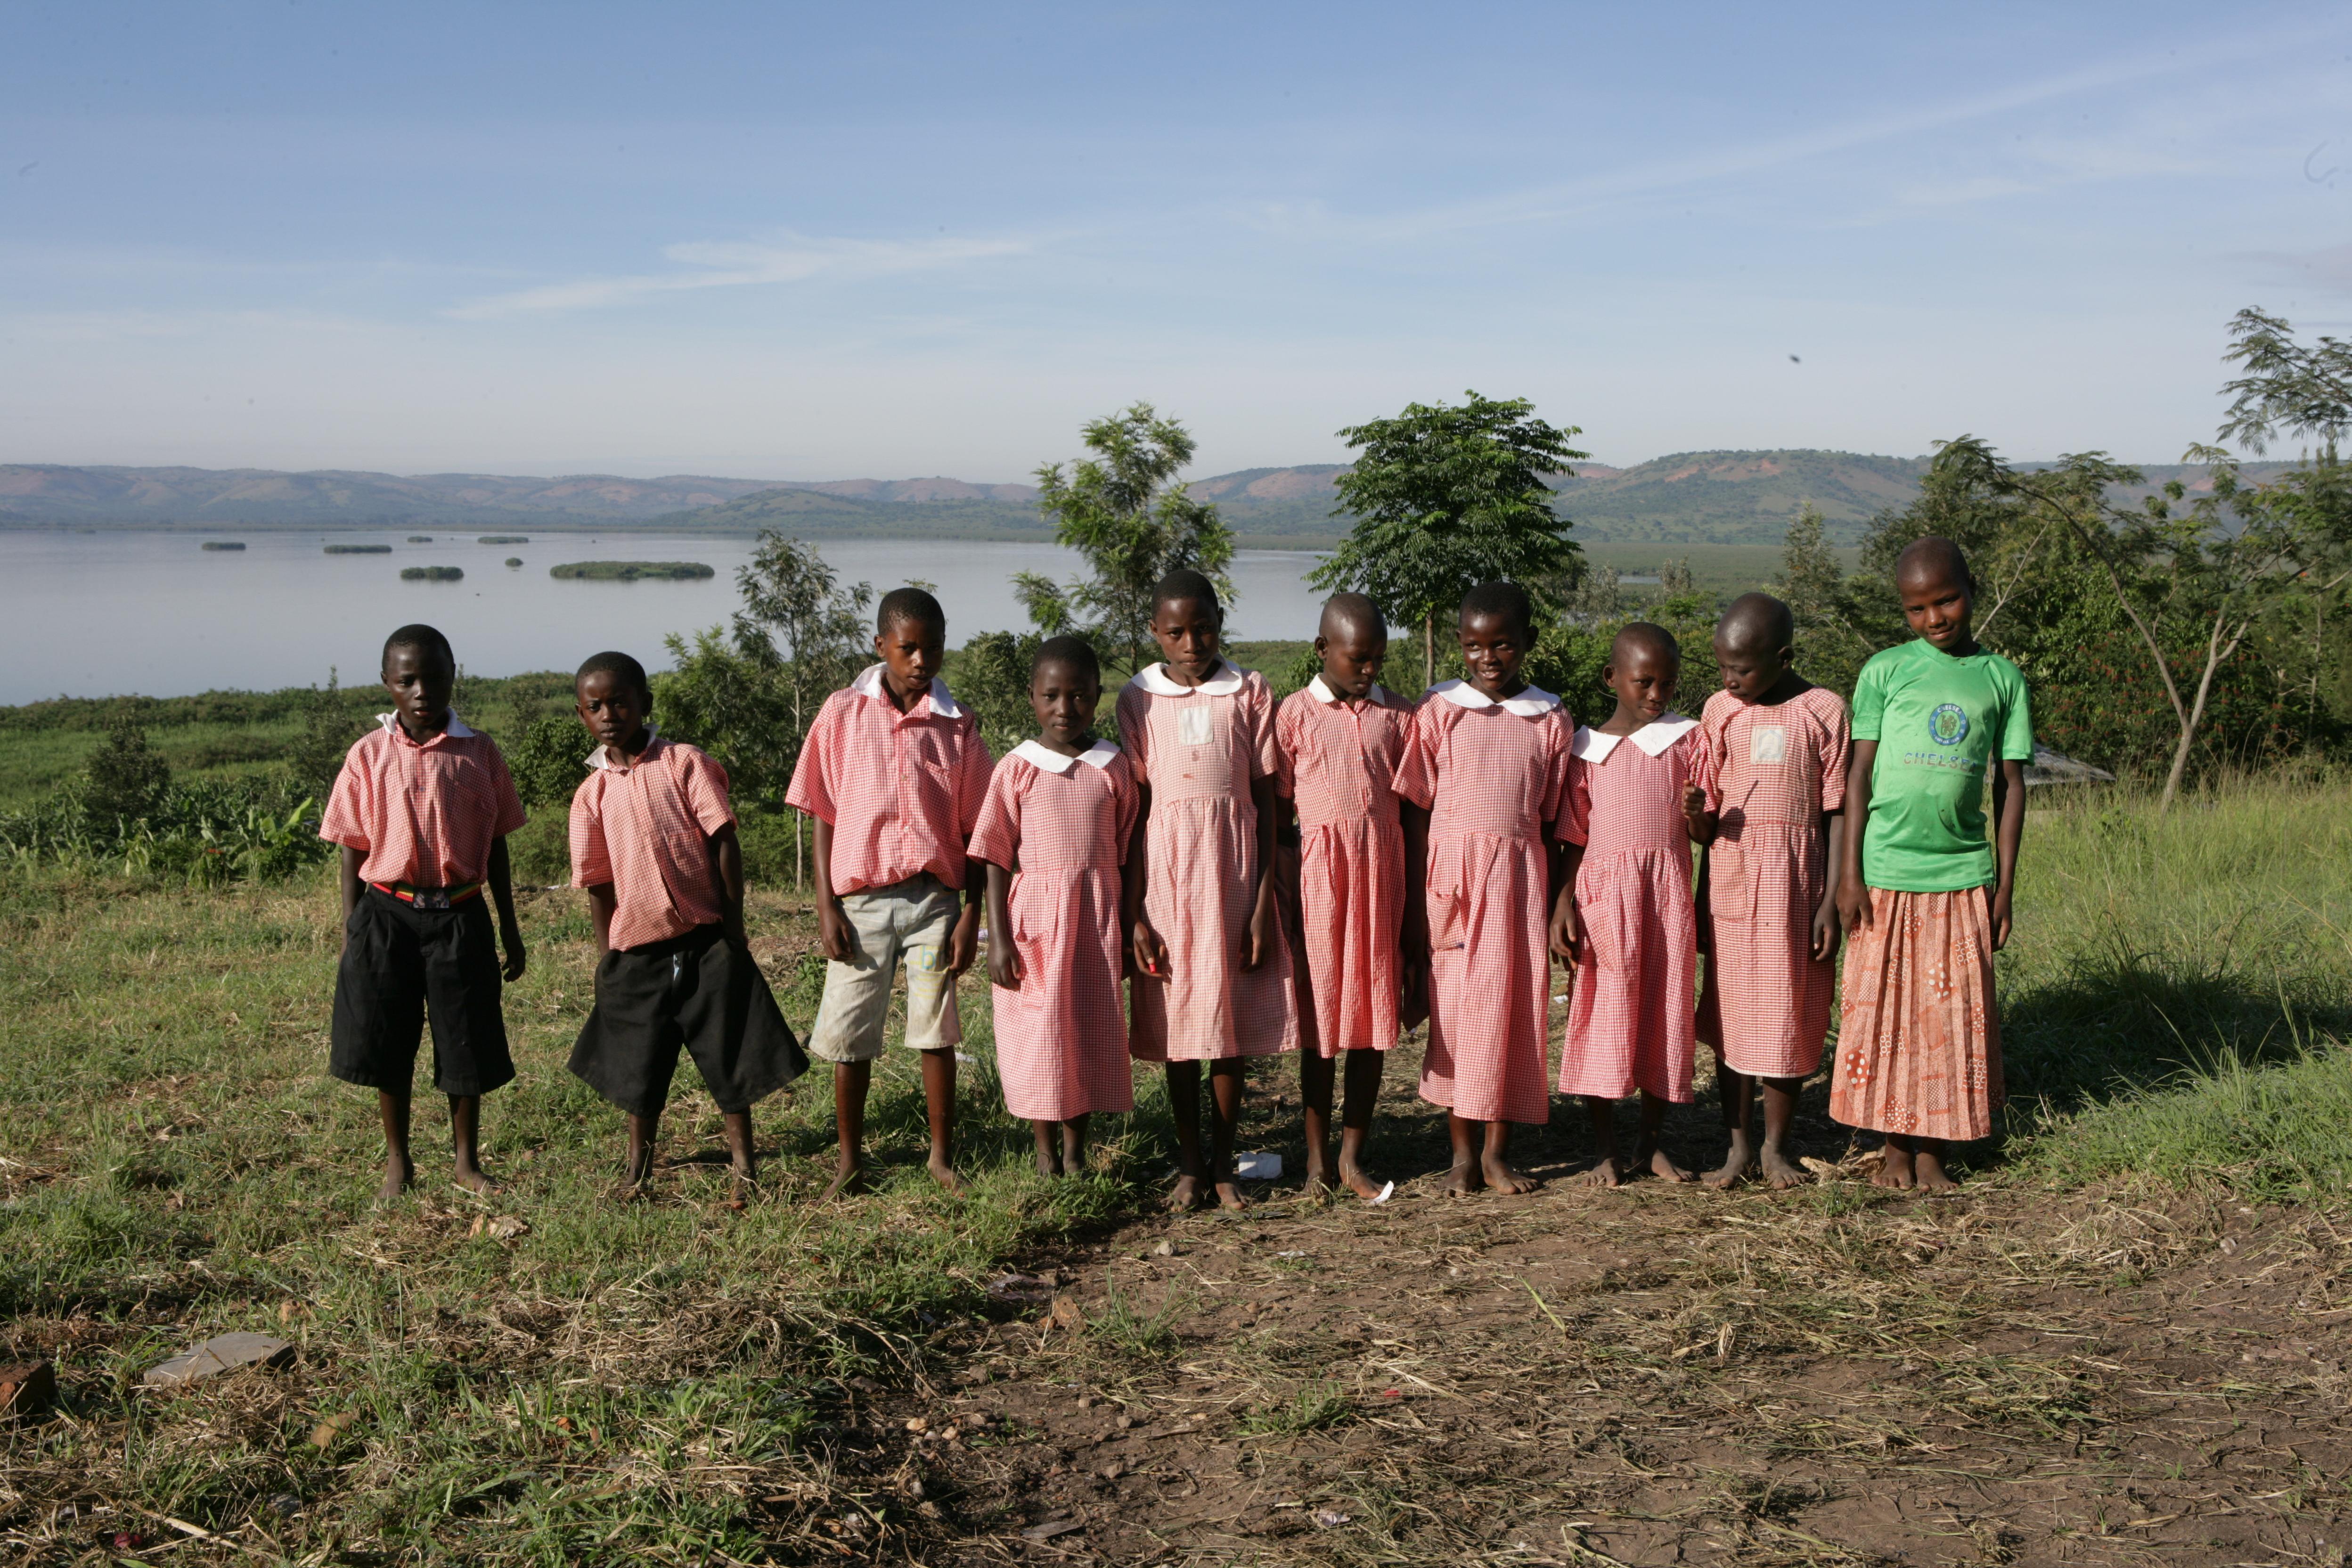 Verdens Boern - Fattigdom i Uganda